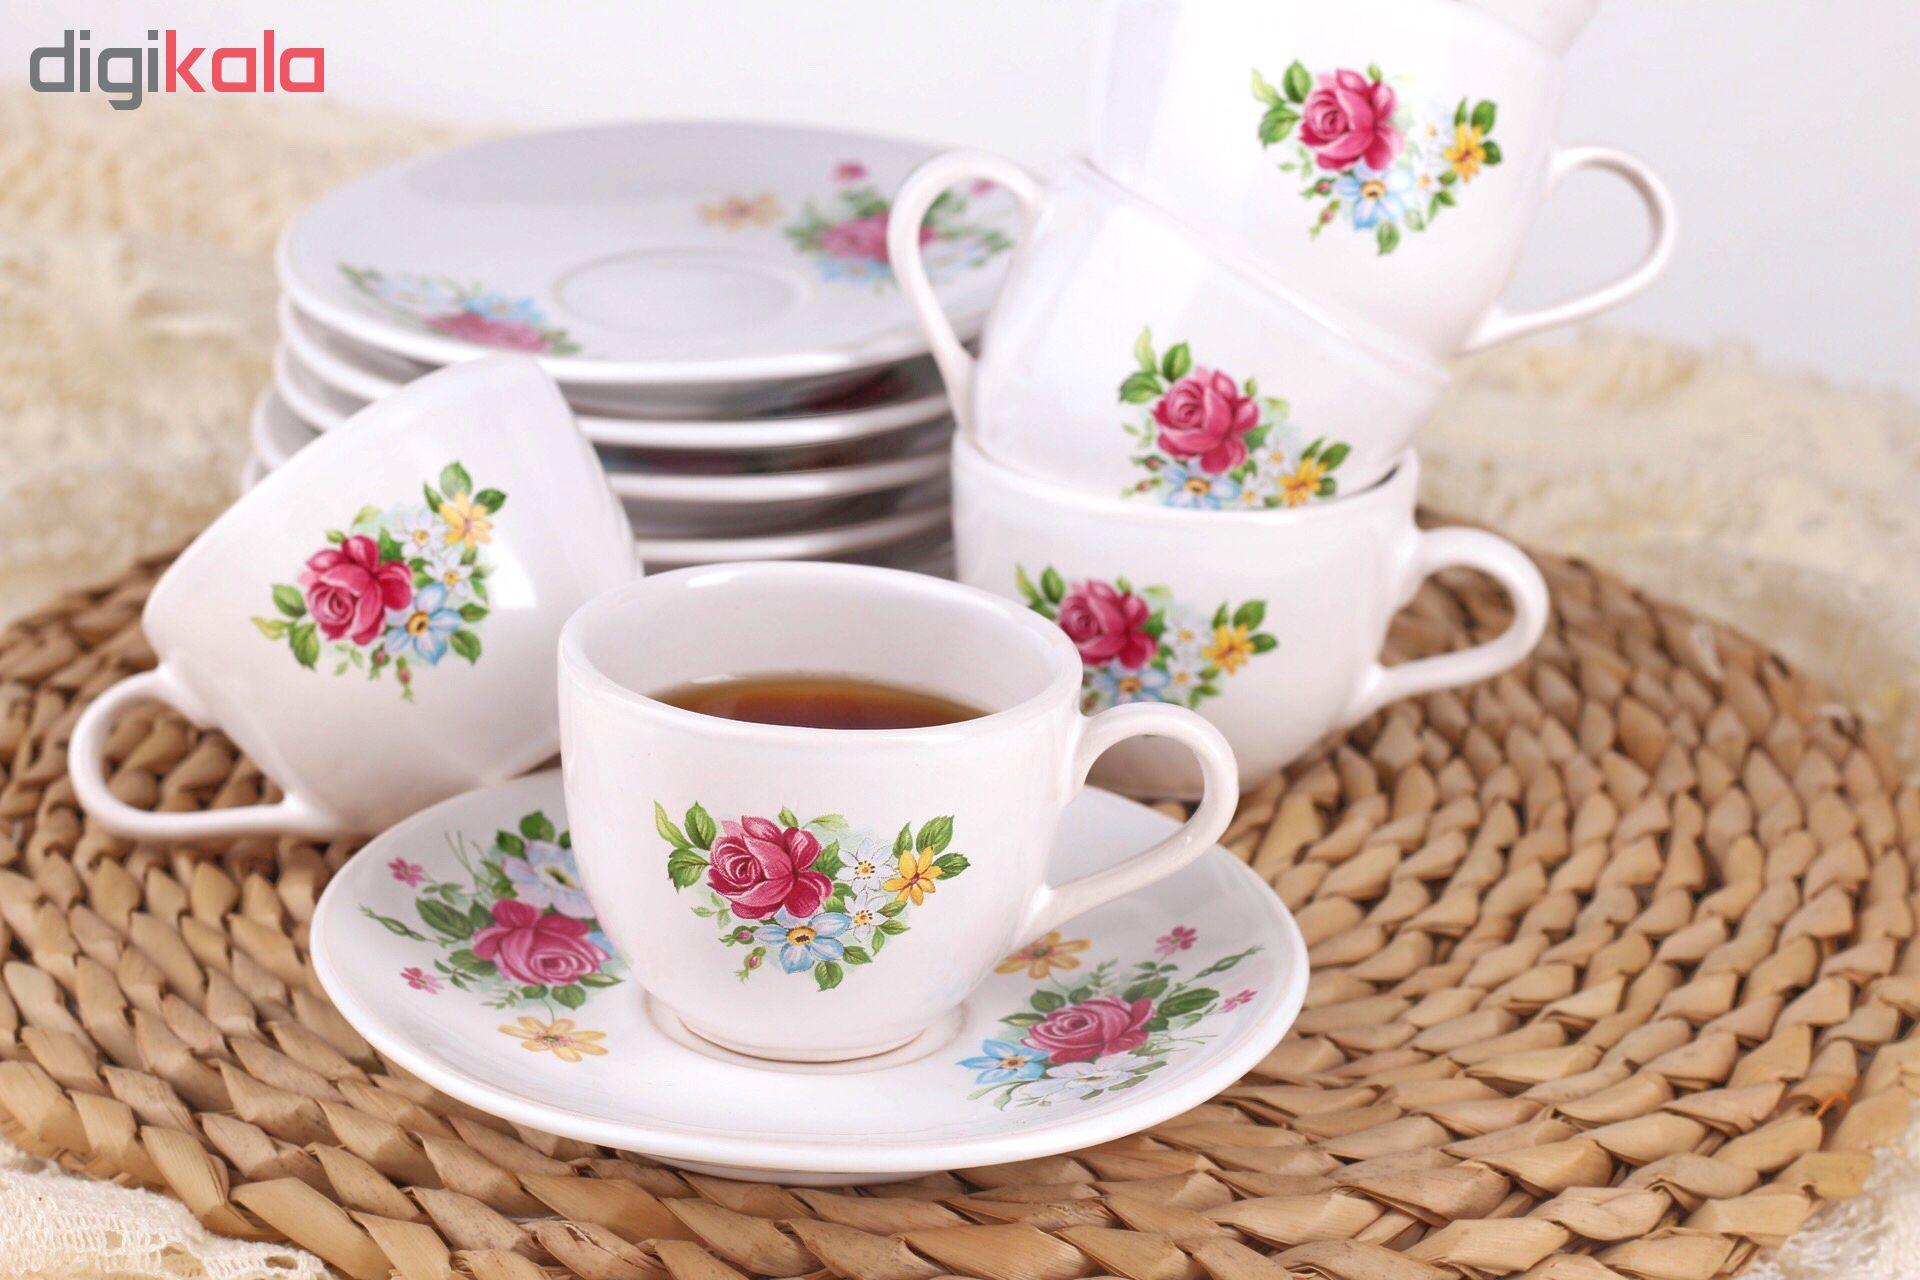 سرویس قهوه خوری 12 پارچه طرح رز کد EA15